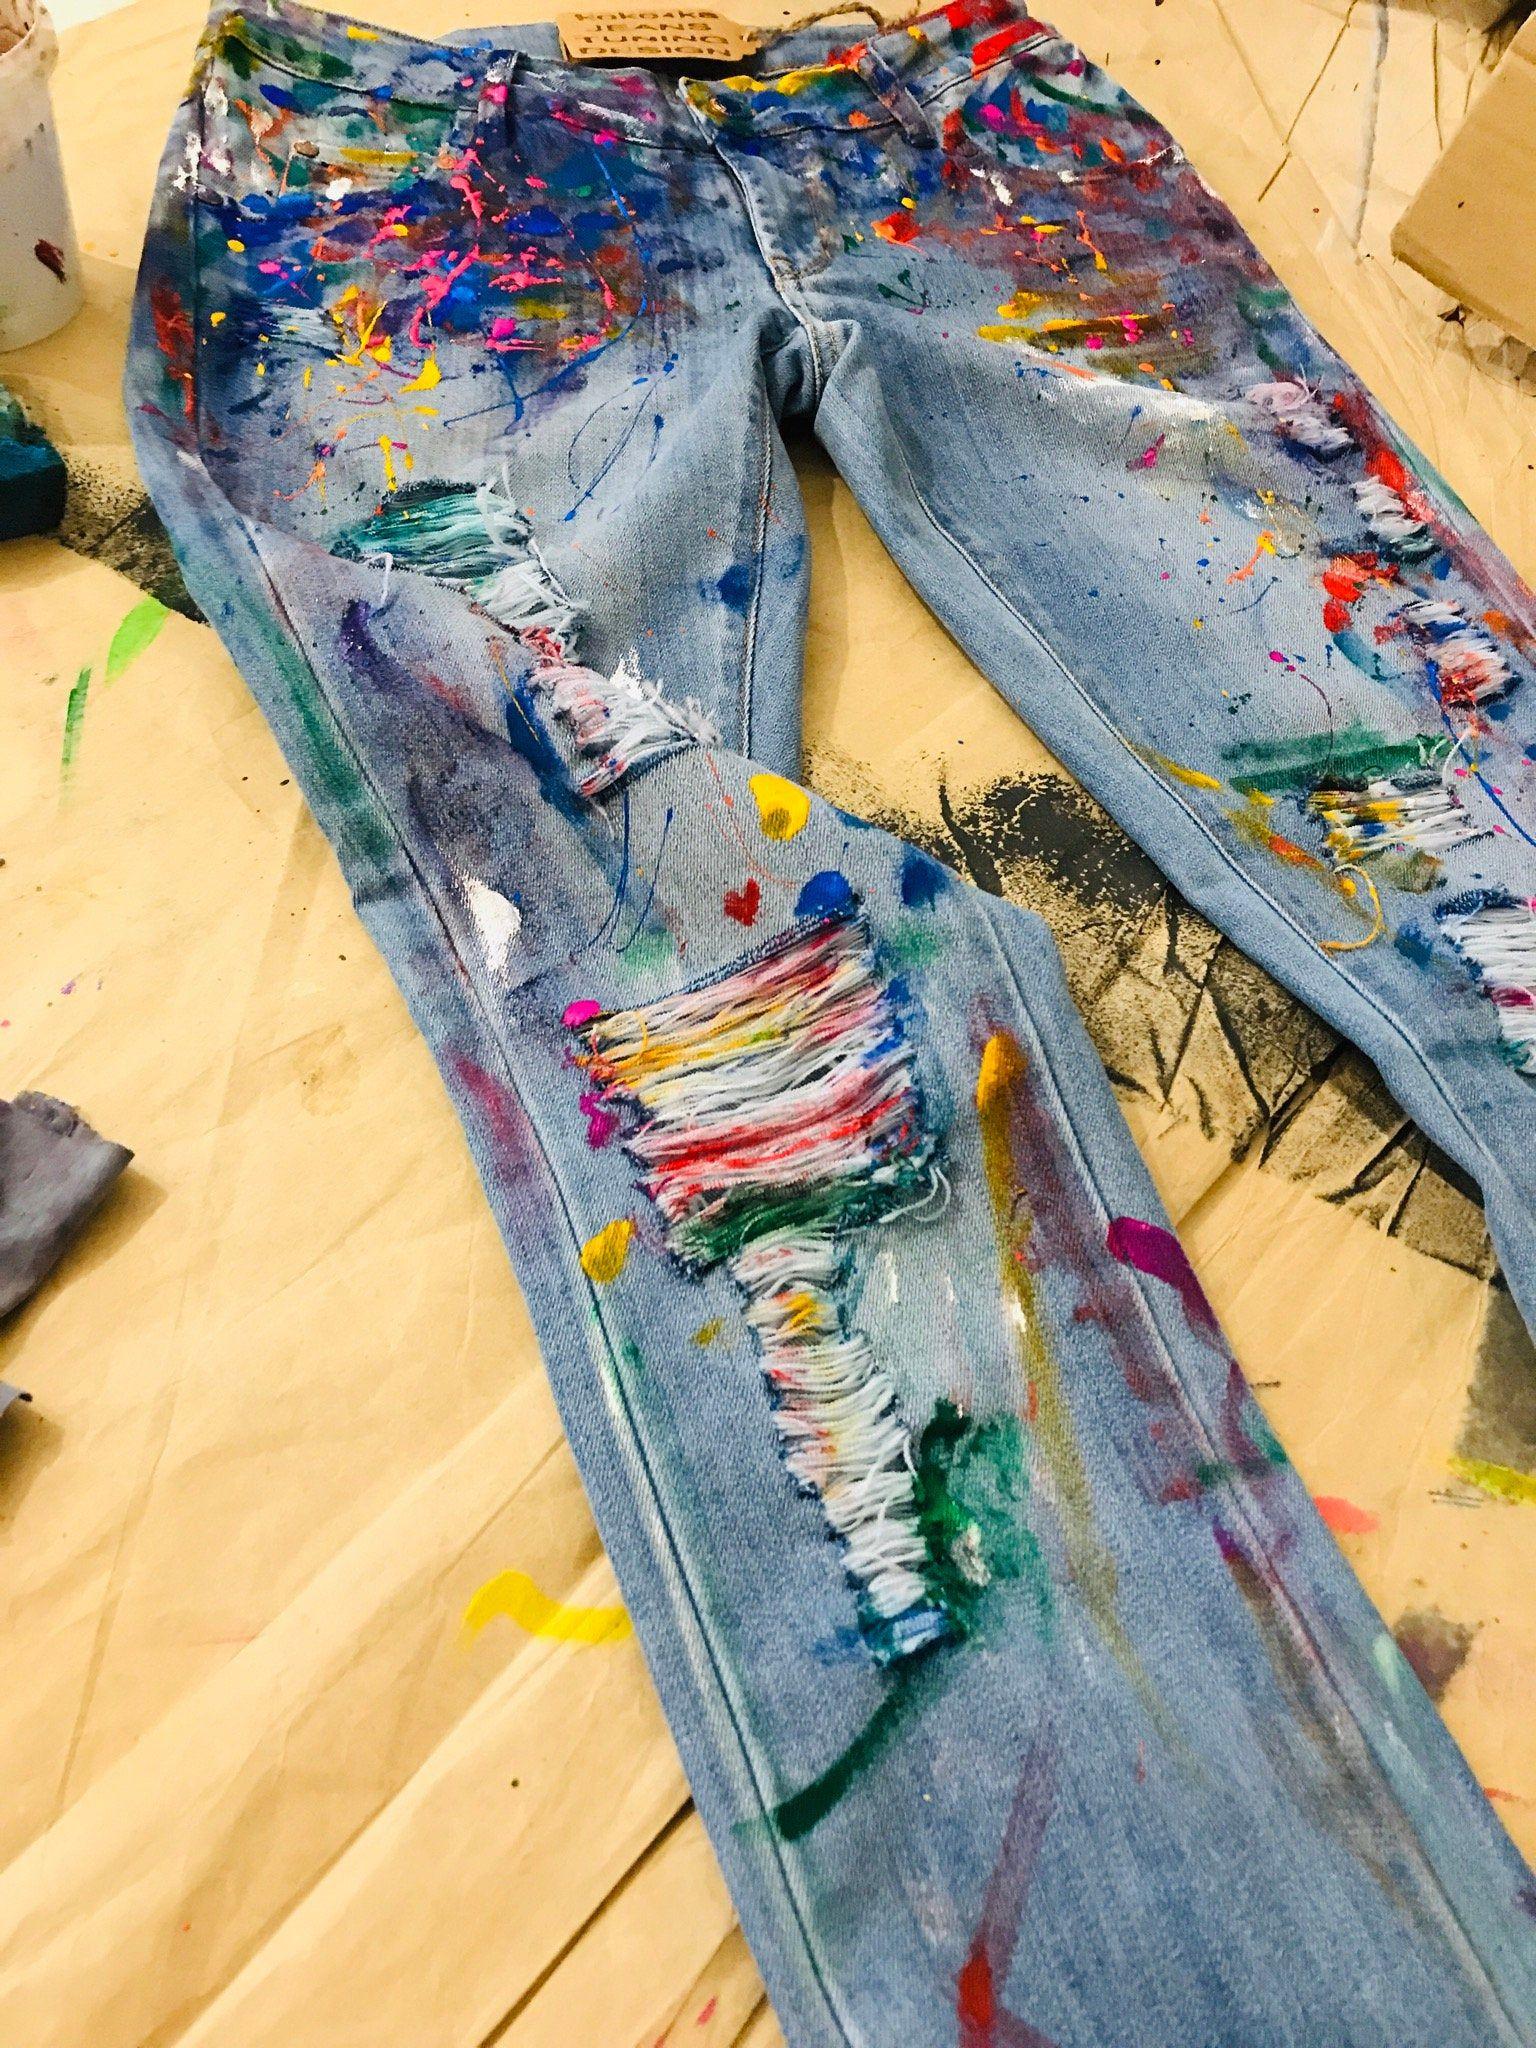 Paint Splatter Jeans Spray Paint Clothing Blots Jeans Spray Paint Paint Splatter Jeans Festival Clothing Boho Jeans Art Jeans Wearable Art Paint Splatter Jeans Painted Clothes Hand Painted Clothing [ 2048 x 1536 Pixel ]